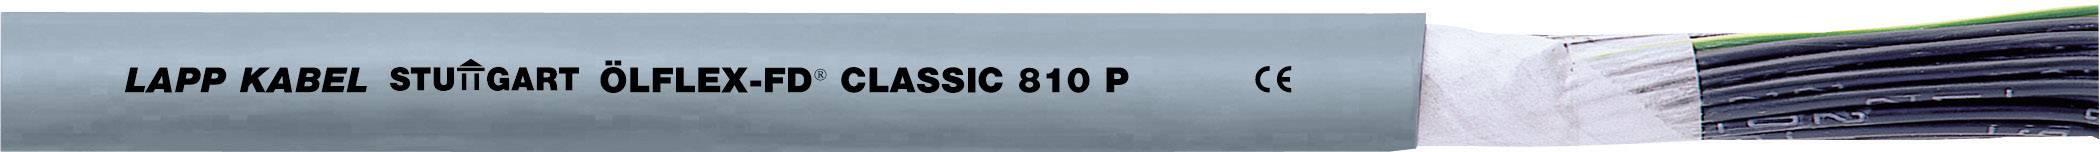 Tažný kabel LappKabel ÖLFLEX® FD CLASSIC 810 P 7G0,5 (0026304), 7x 0,5 mm², polyurethan, Ø 8,5 mm, nestíněný,